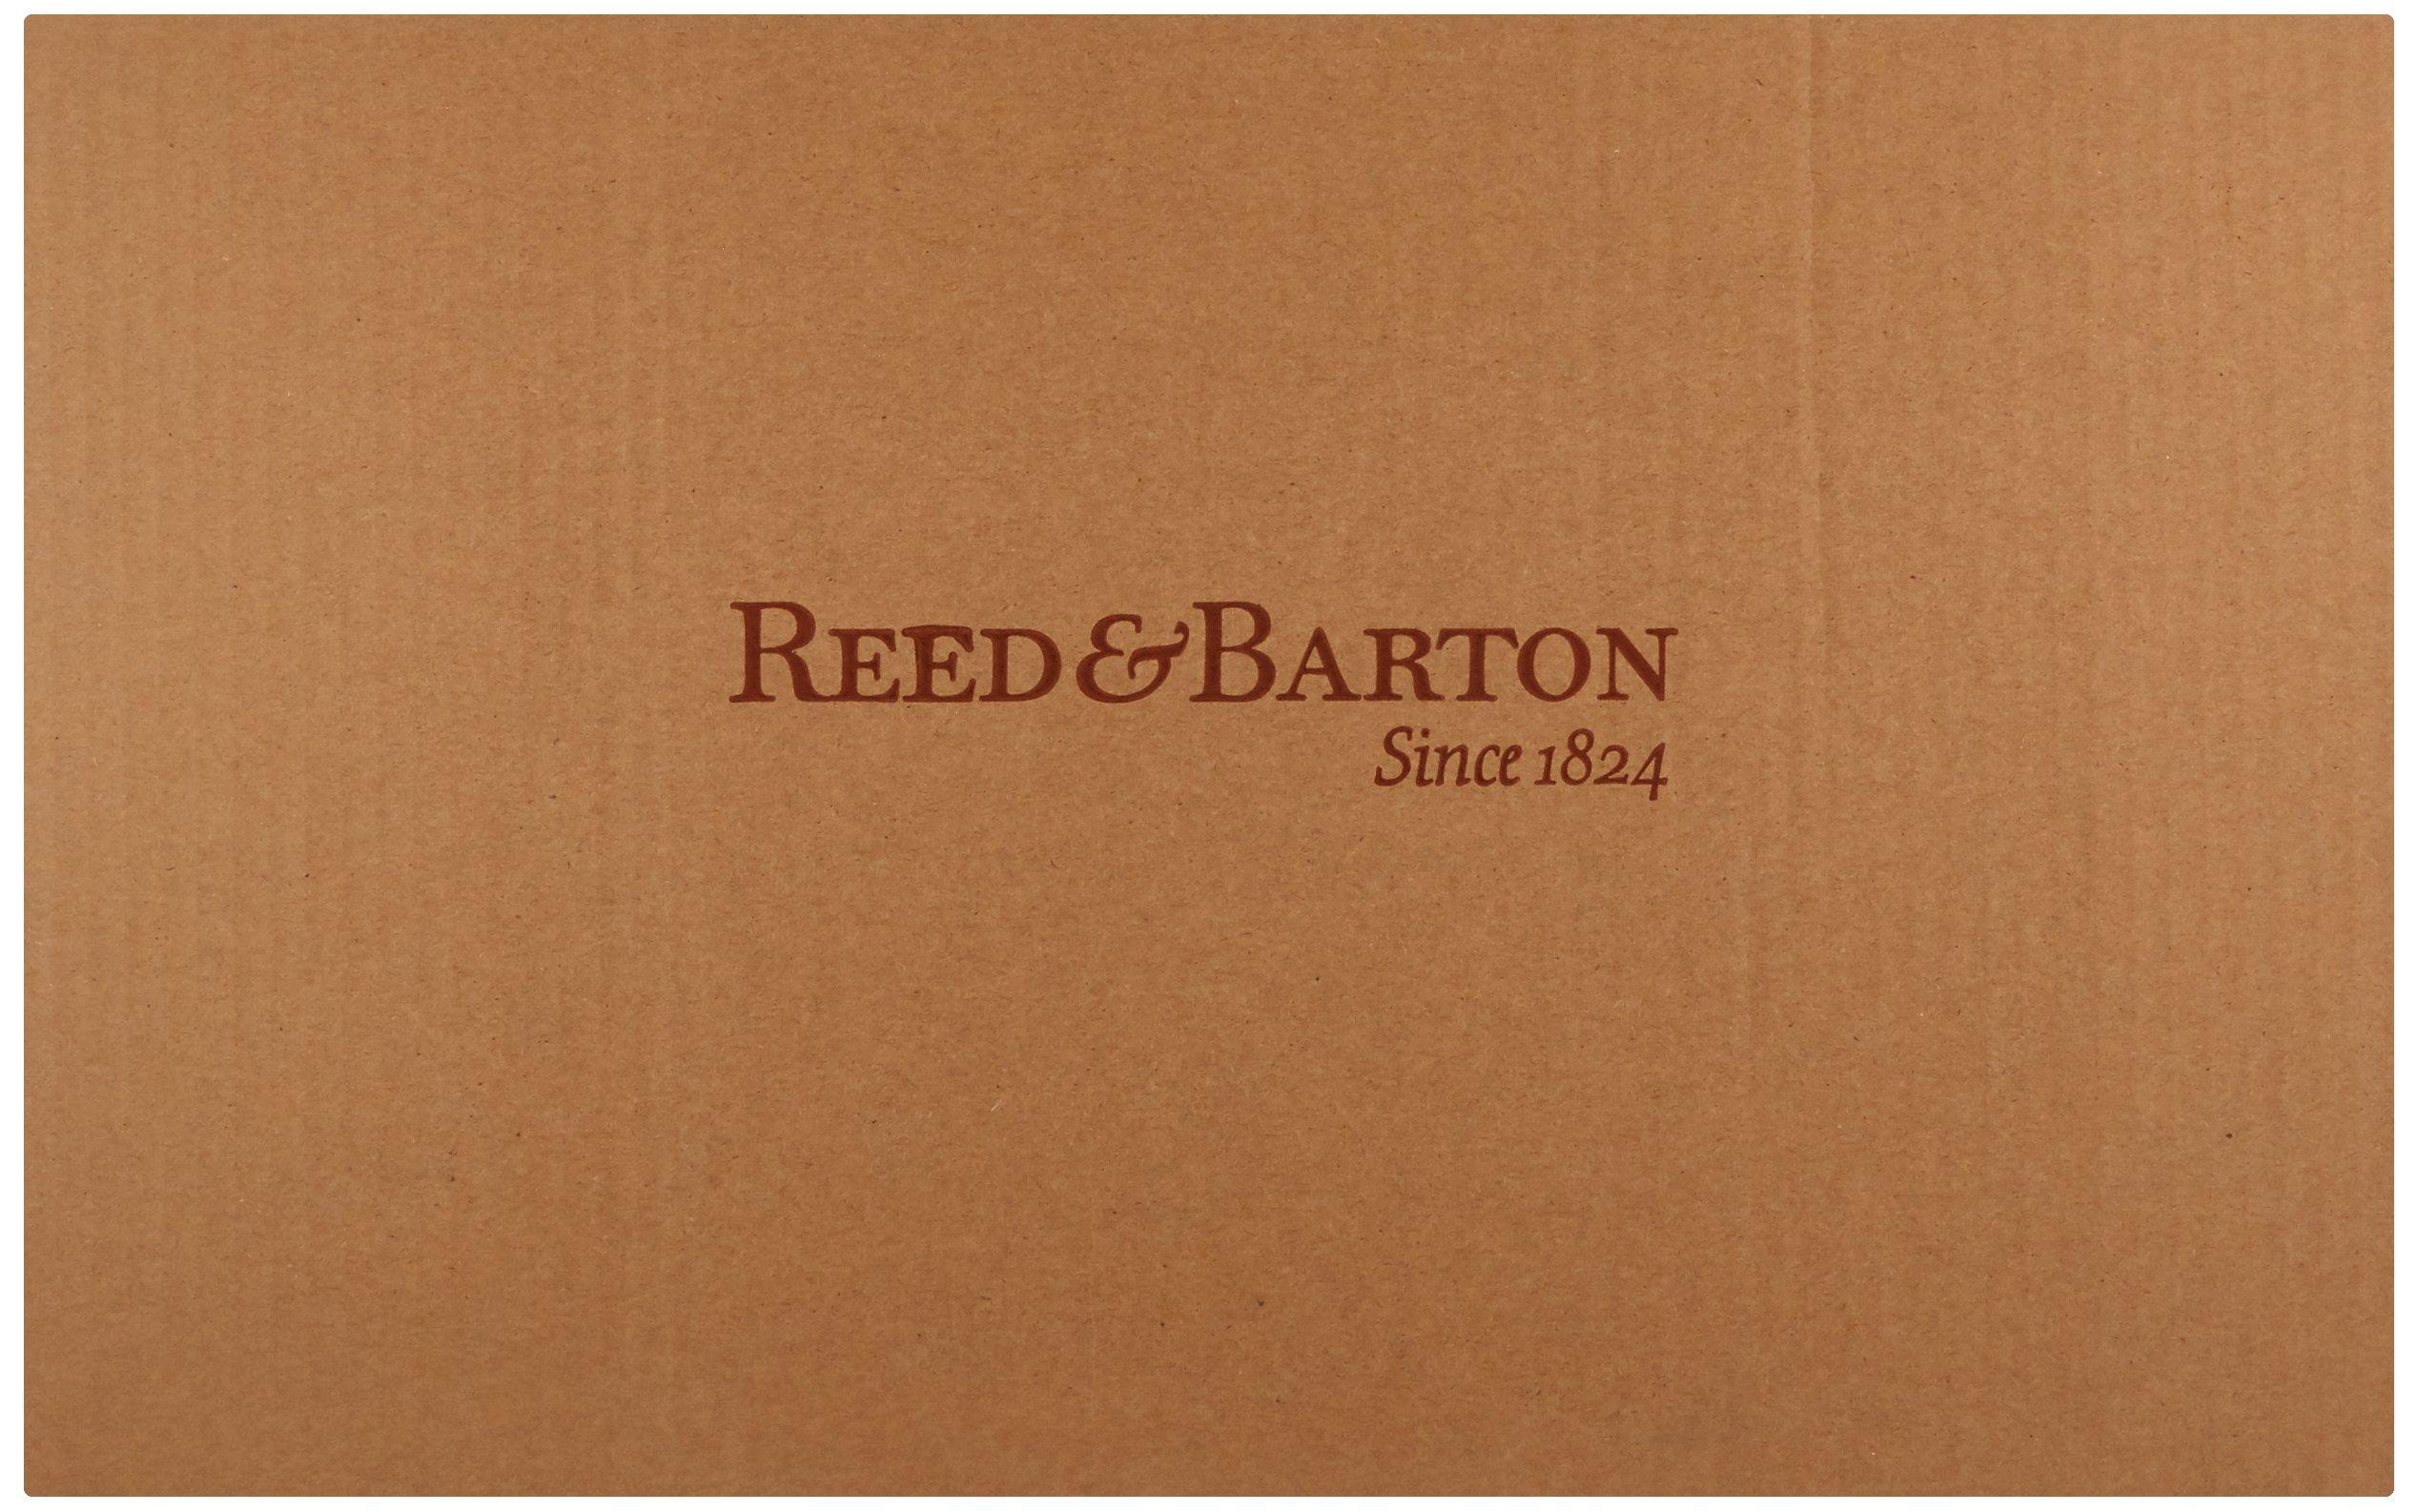 Reed & Barton Bristol Grande Flatware Chest by Reed & Barton (Image #2)